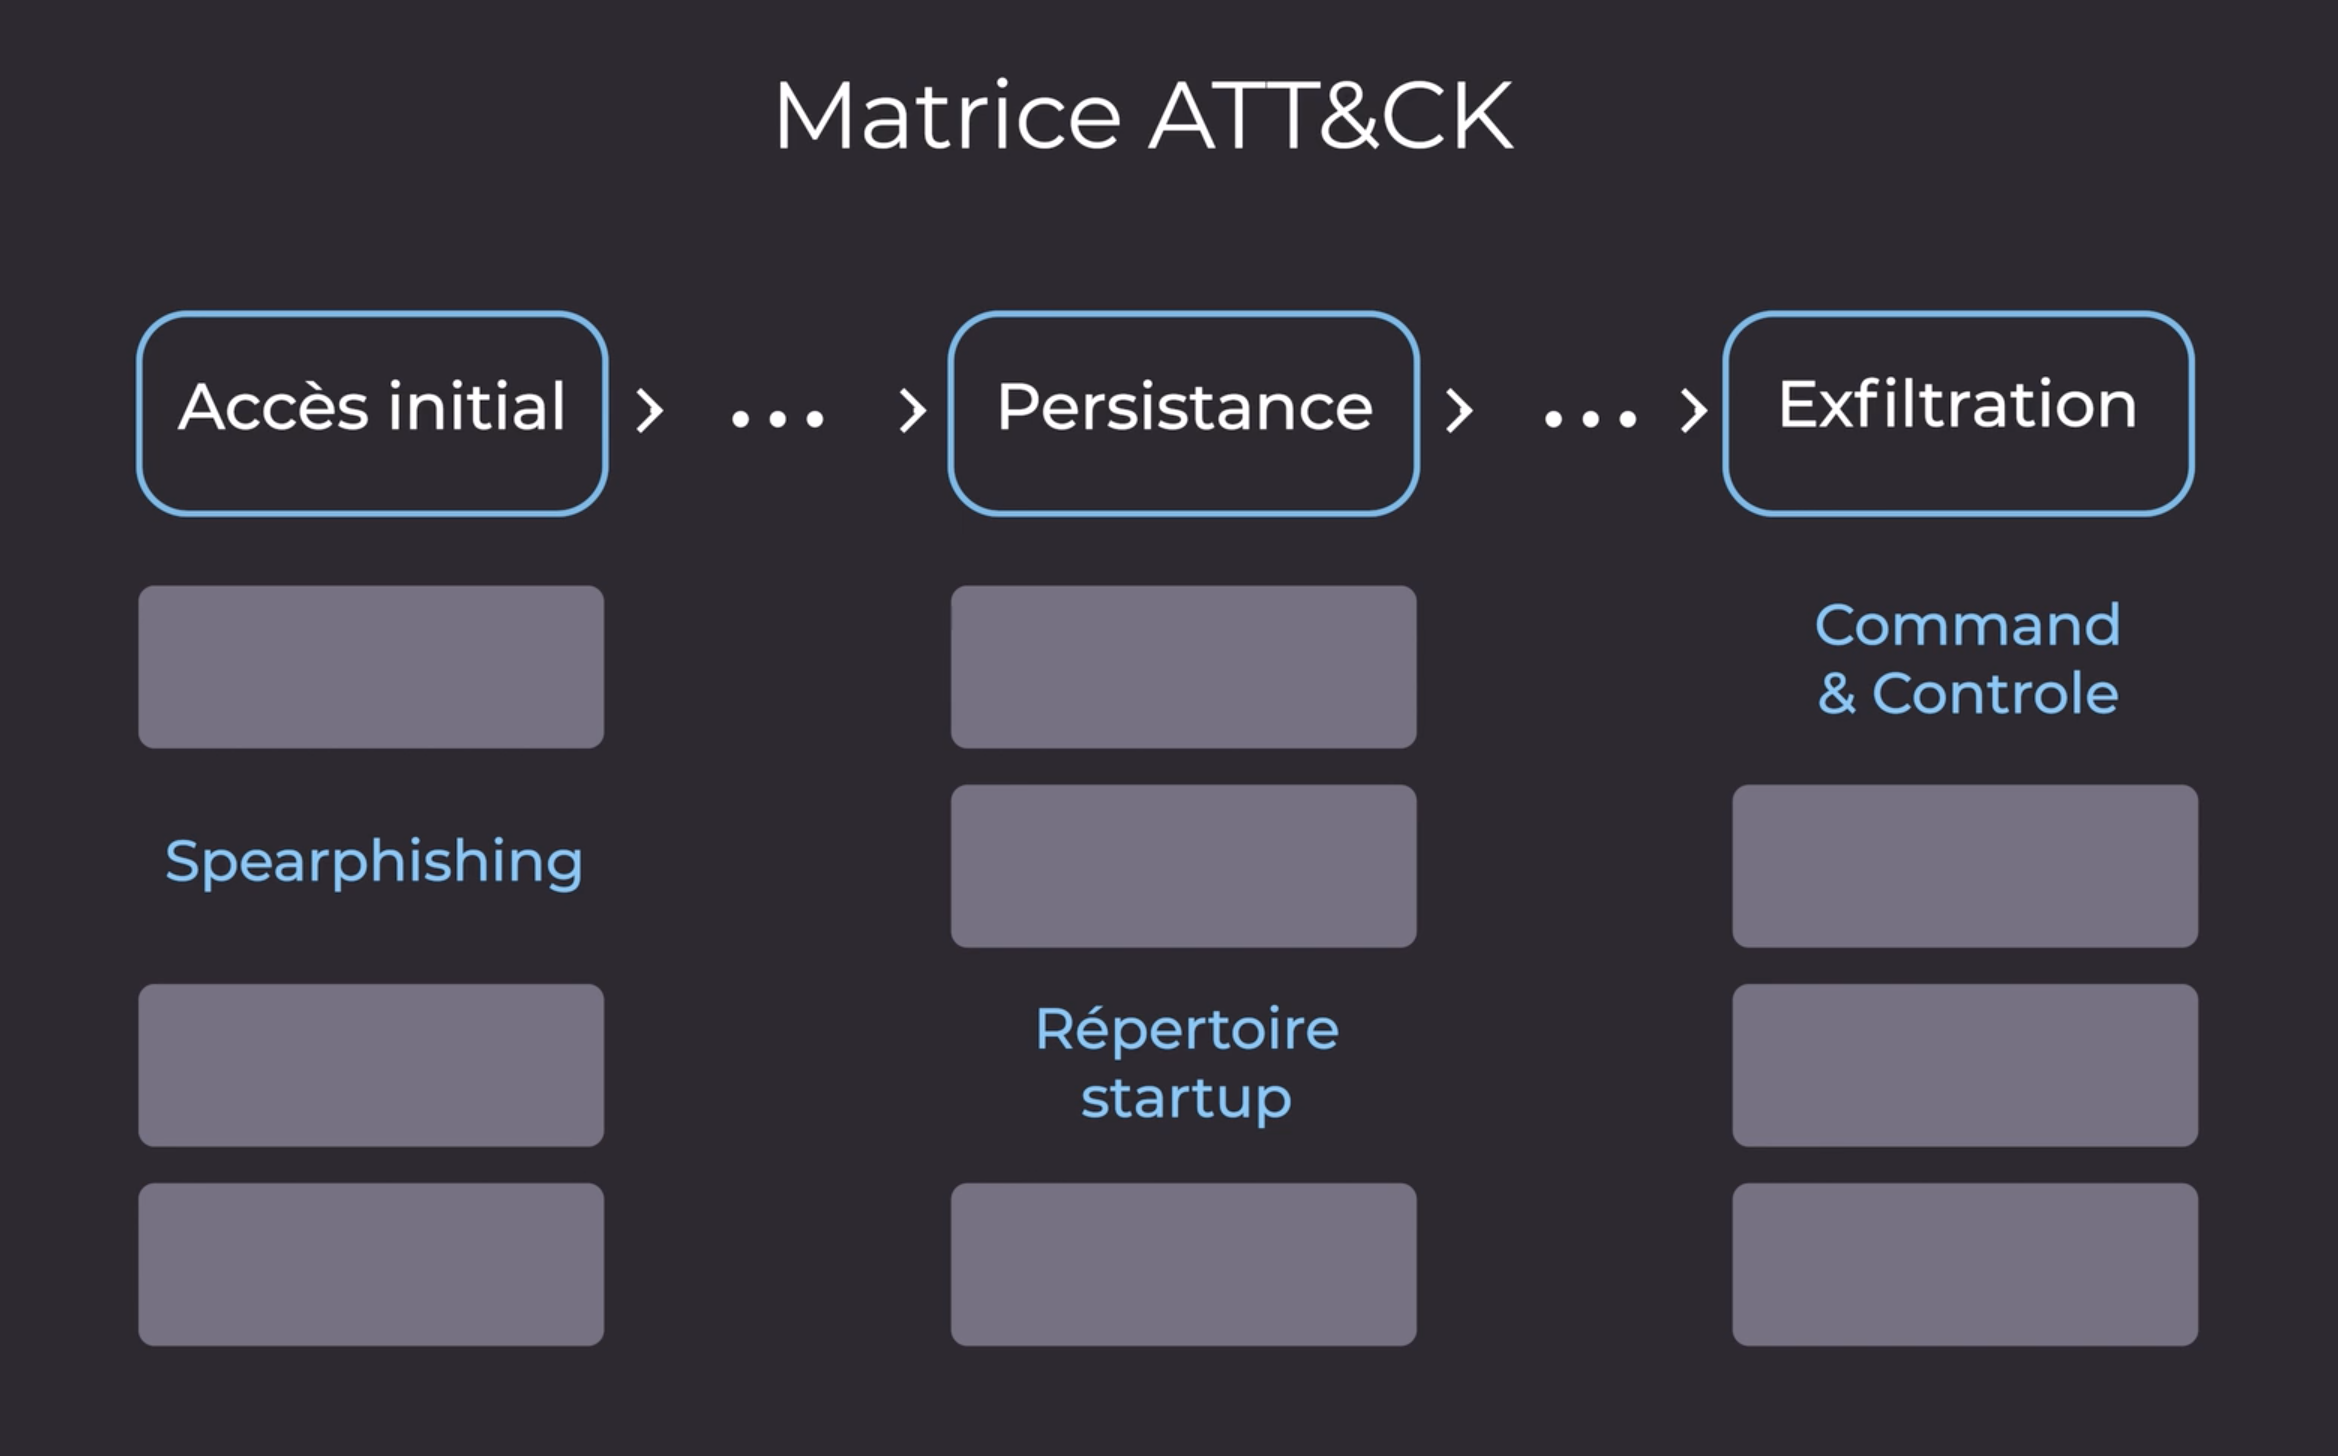 La matrice ATT&CK